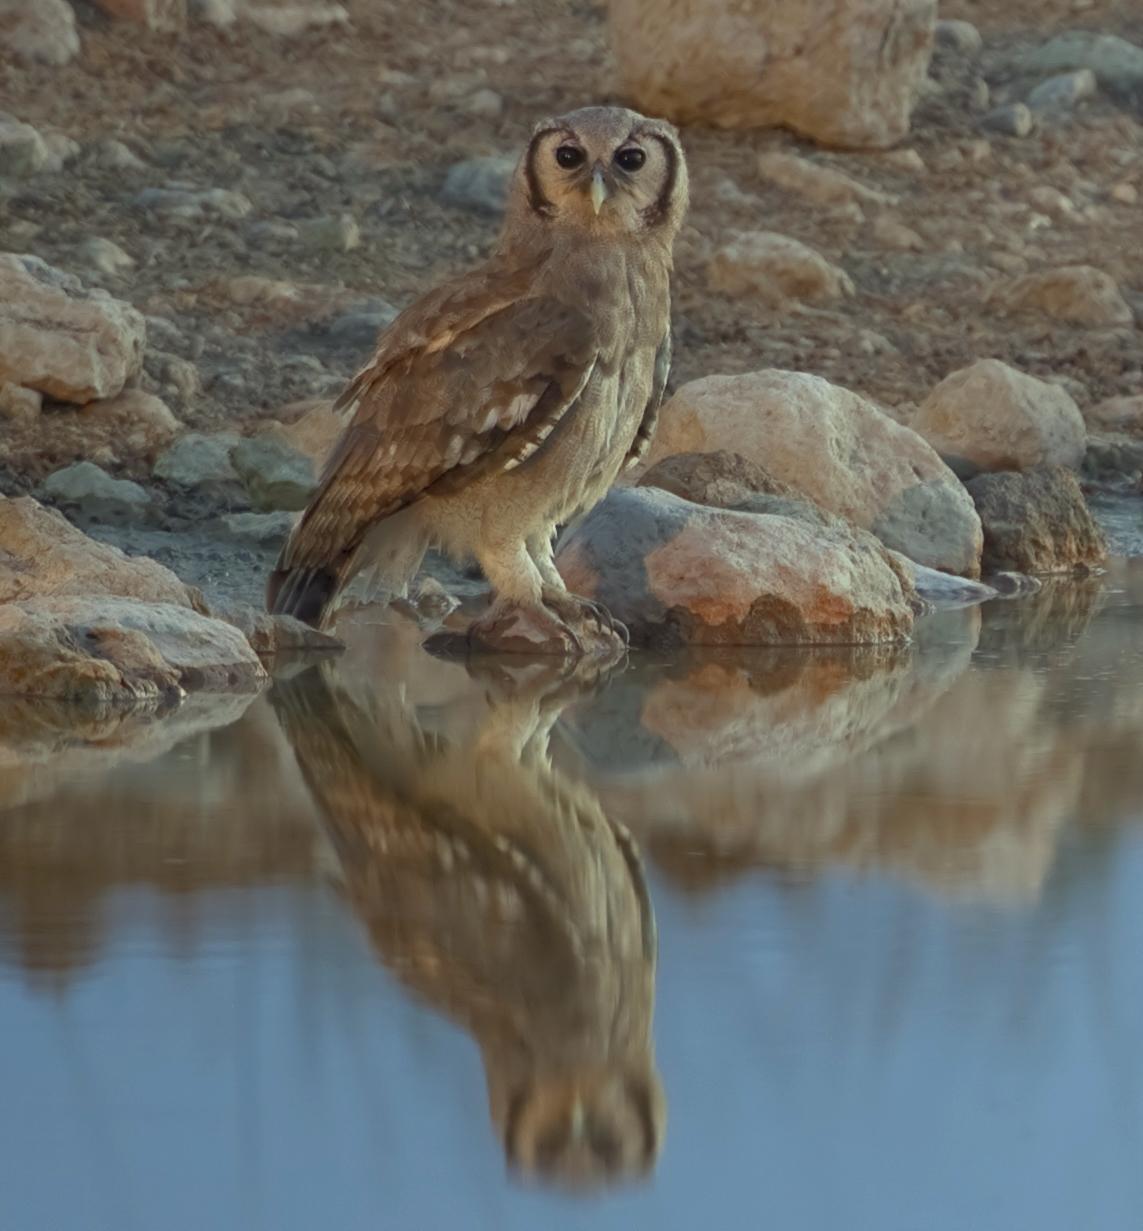 Verreaux's eagle-owl - Wikipedia